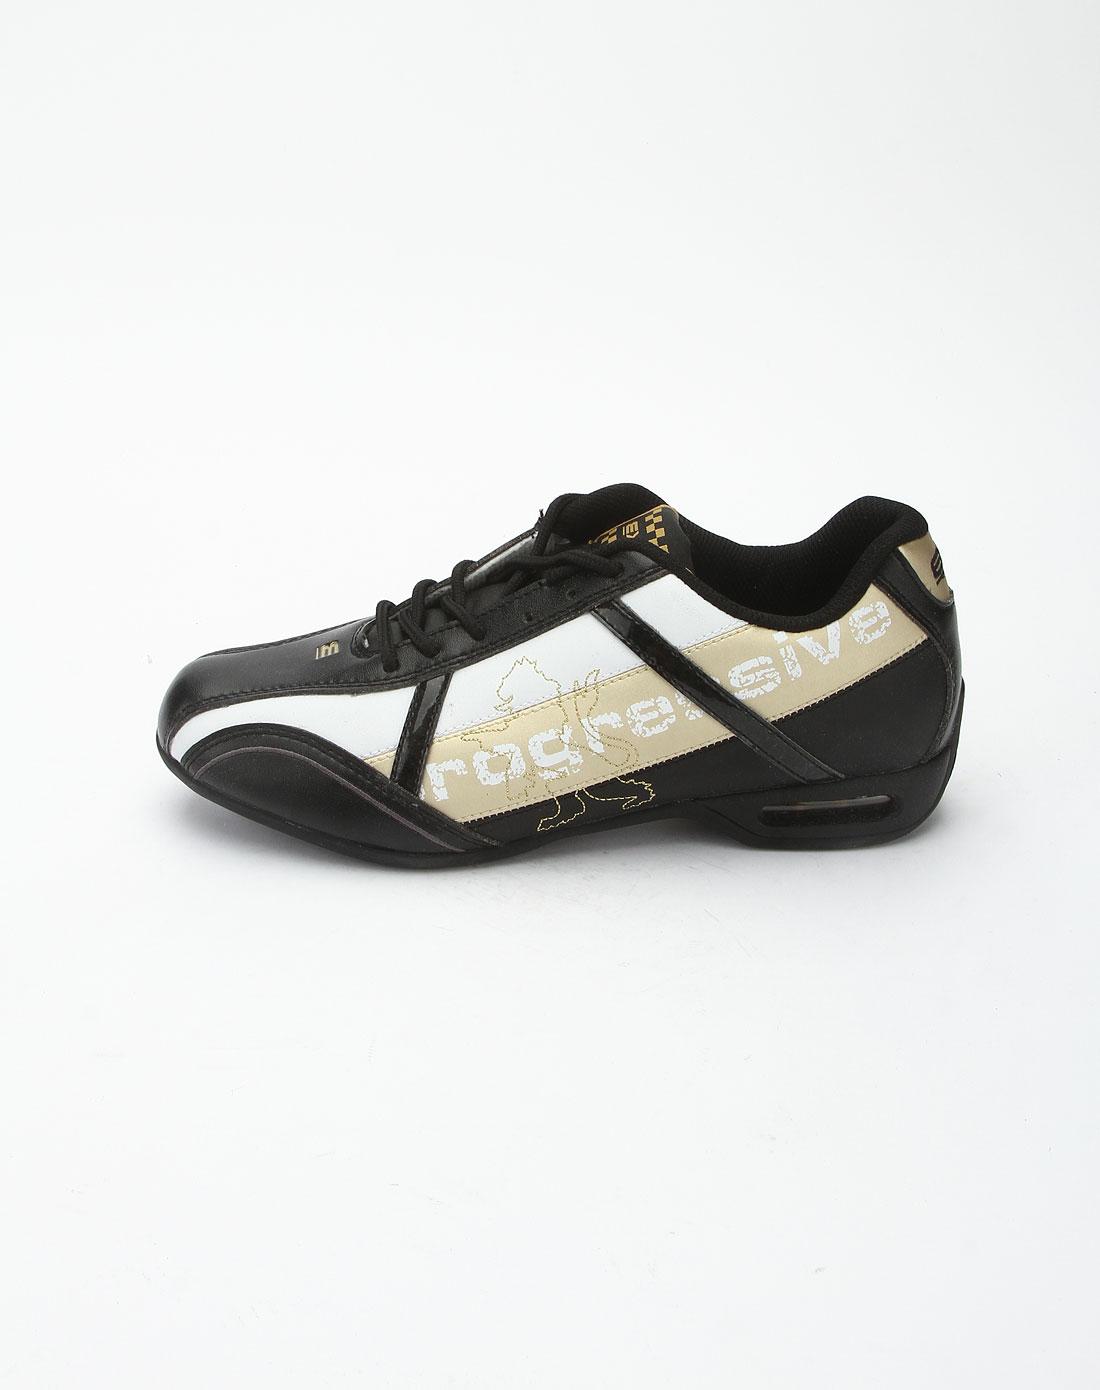 exr黑白拼金色休闲时尚运动鞋ej5rc1afmcwgd